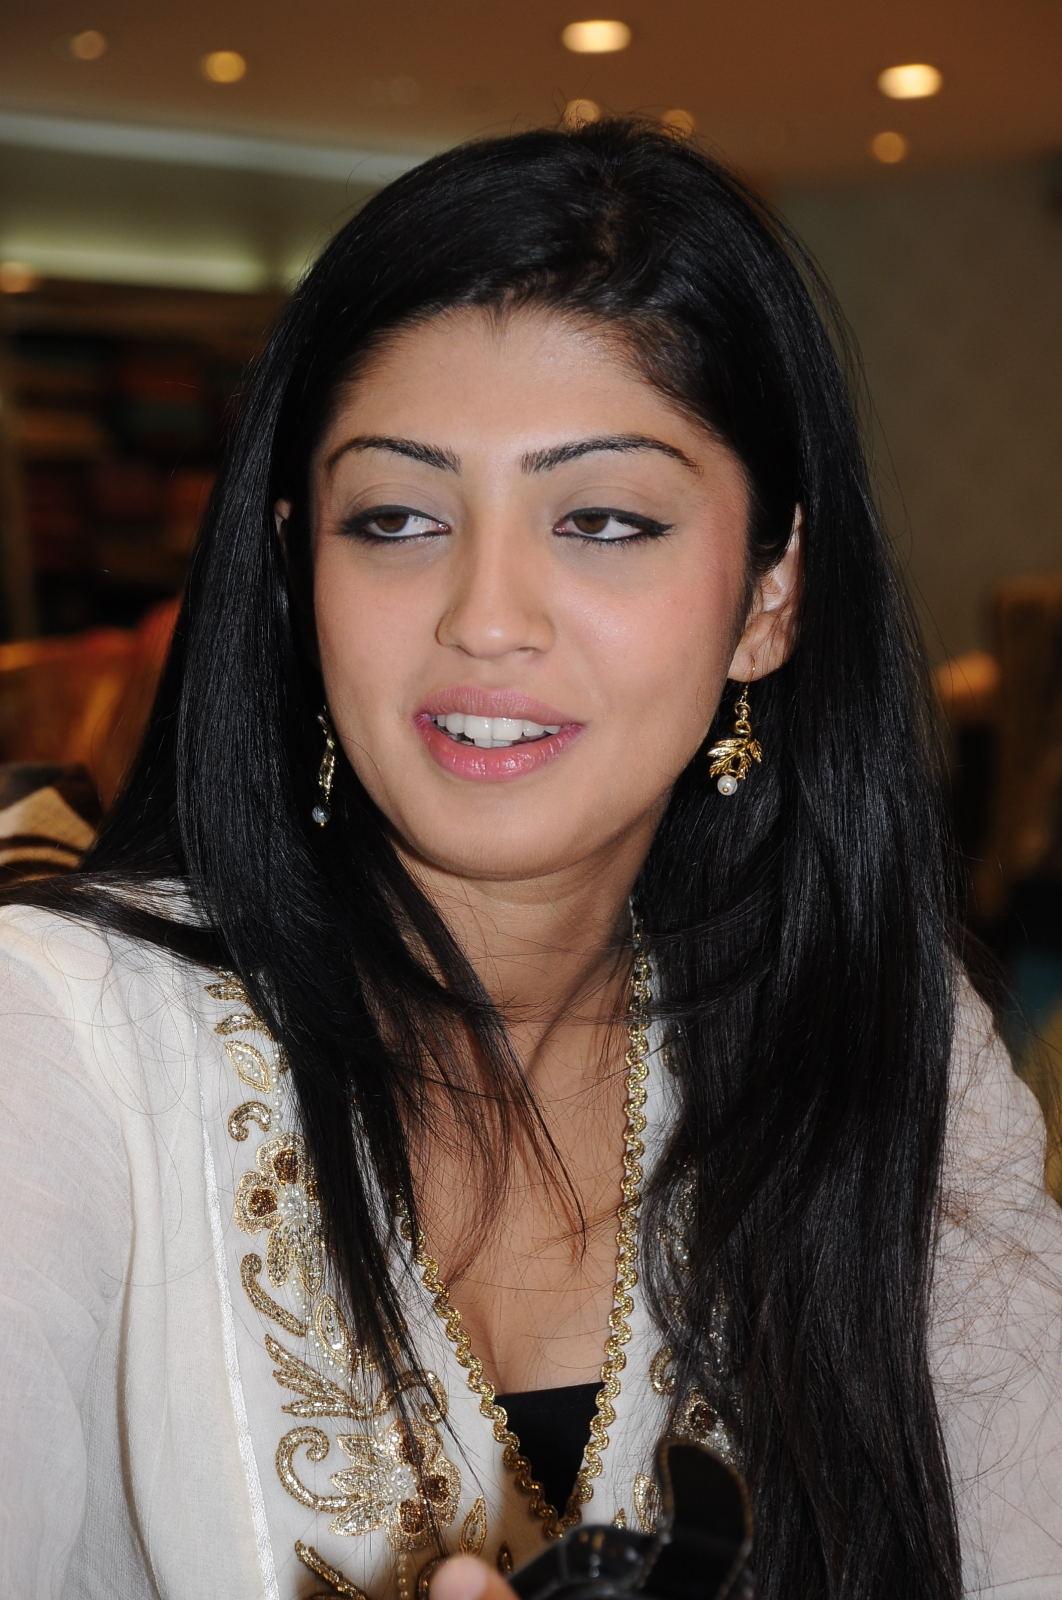 Cute pranitha looking sizzling